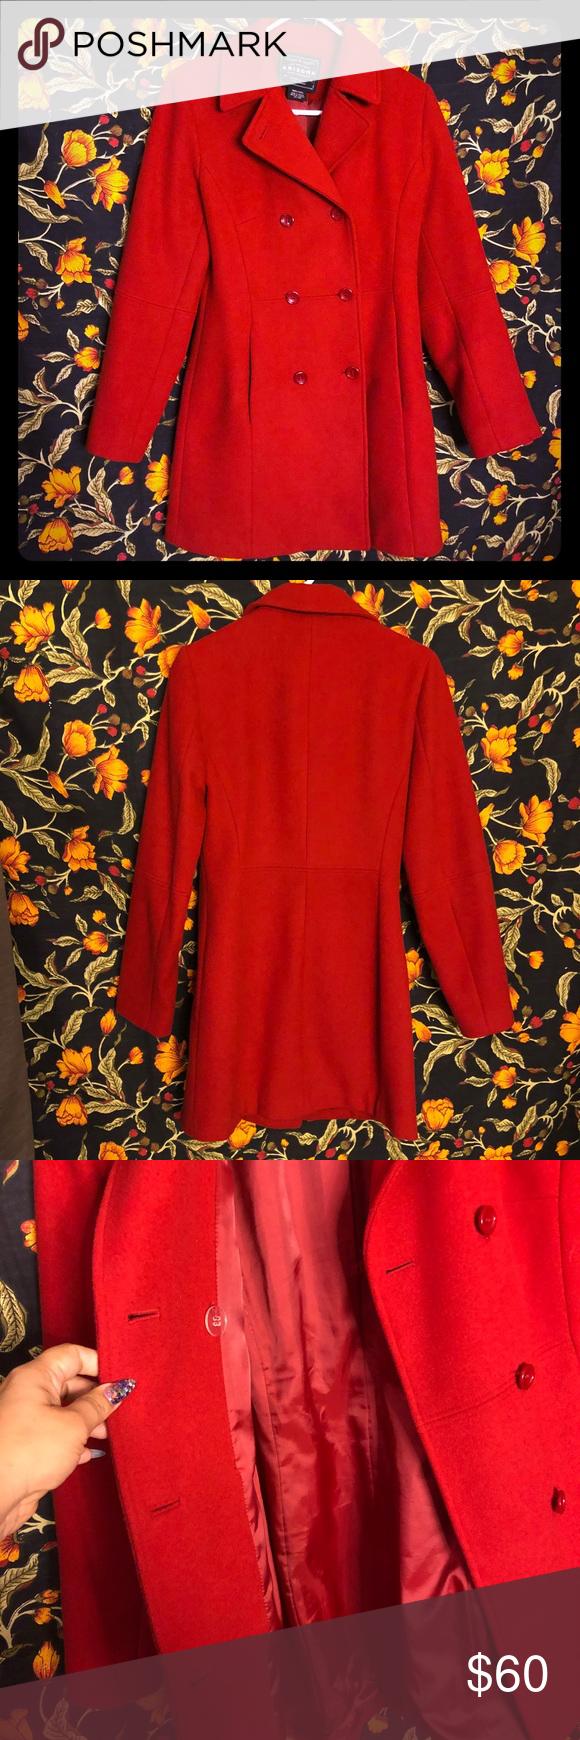 Arizona brand 100 wool red pea coat size Small Red pea